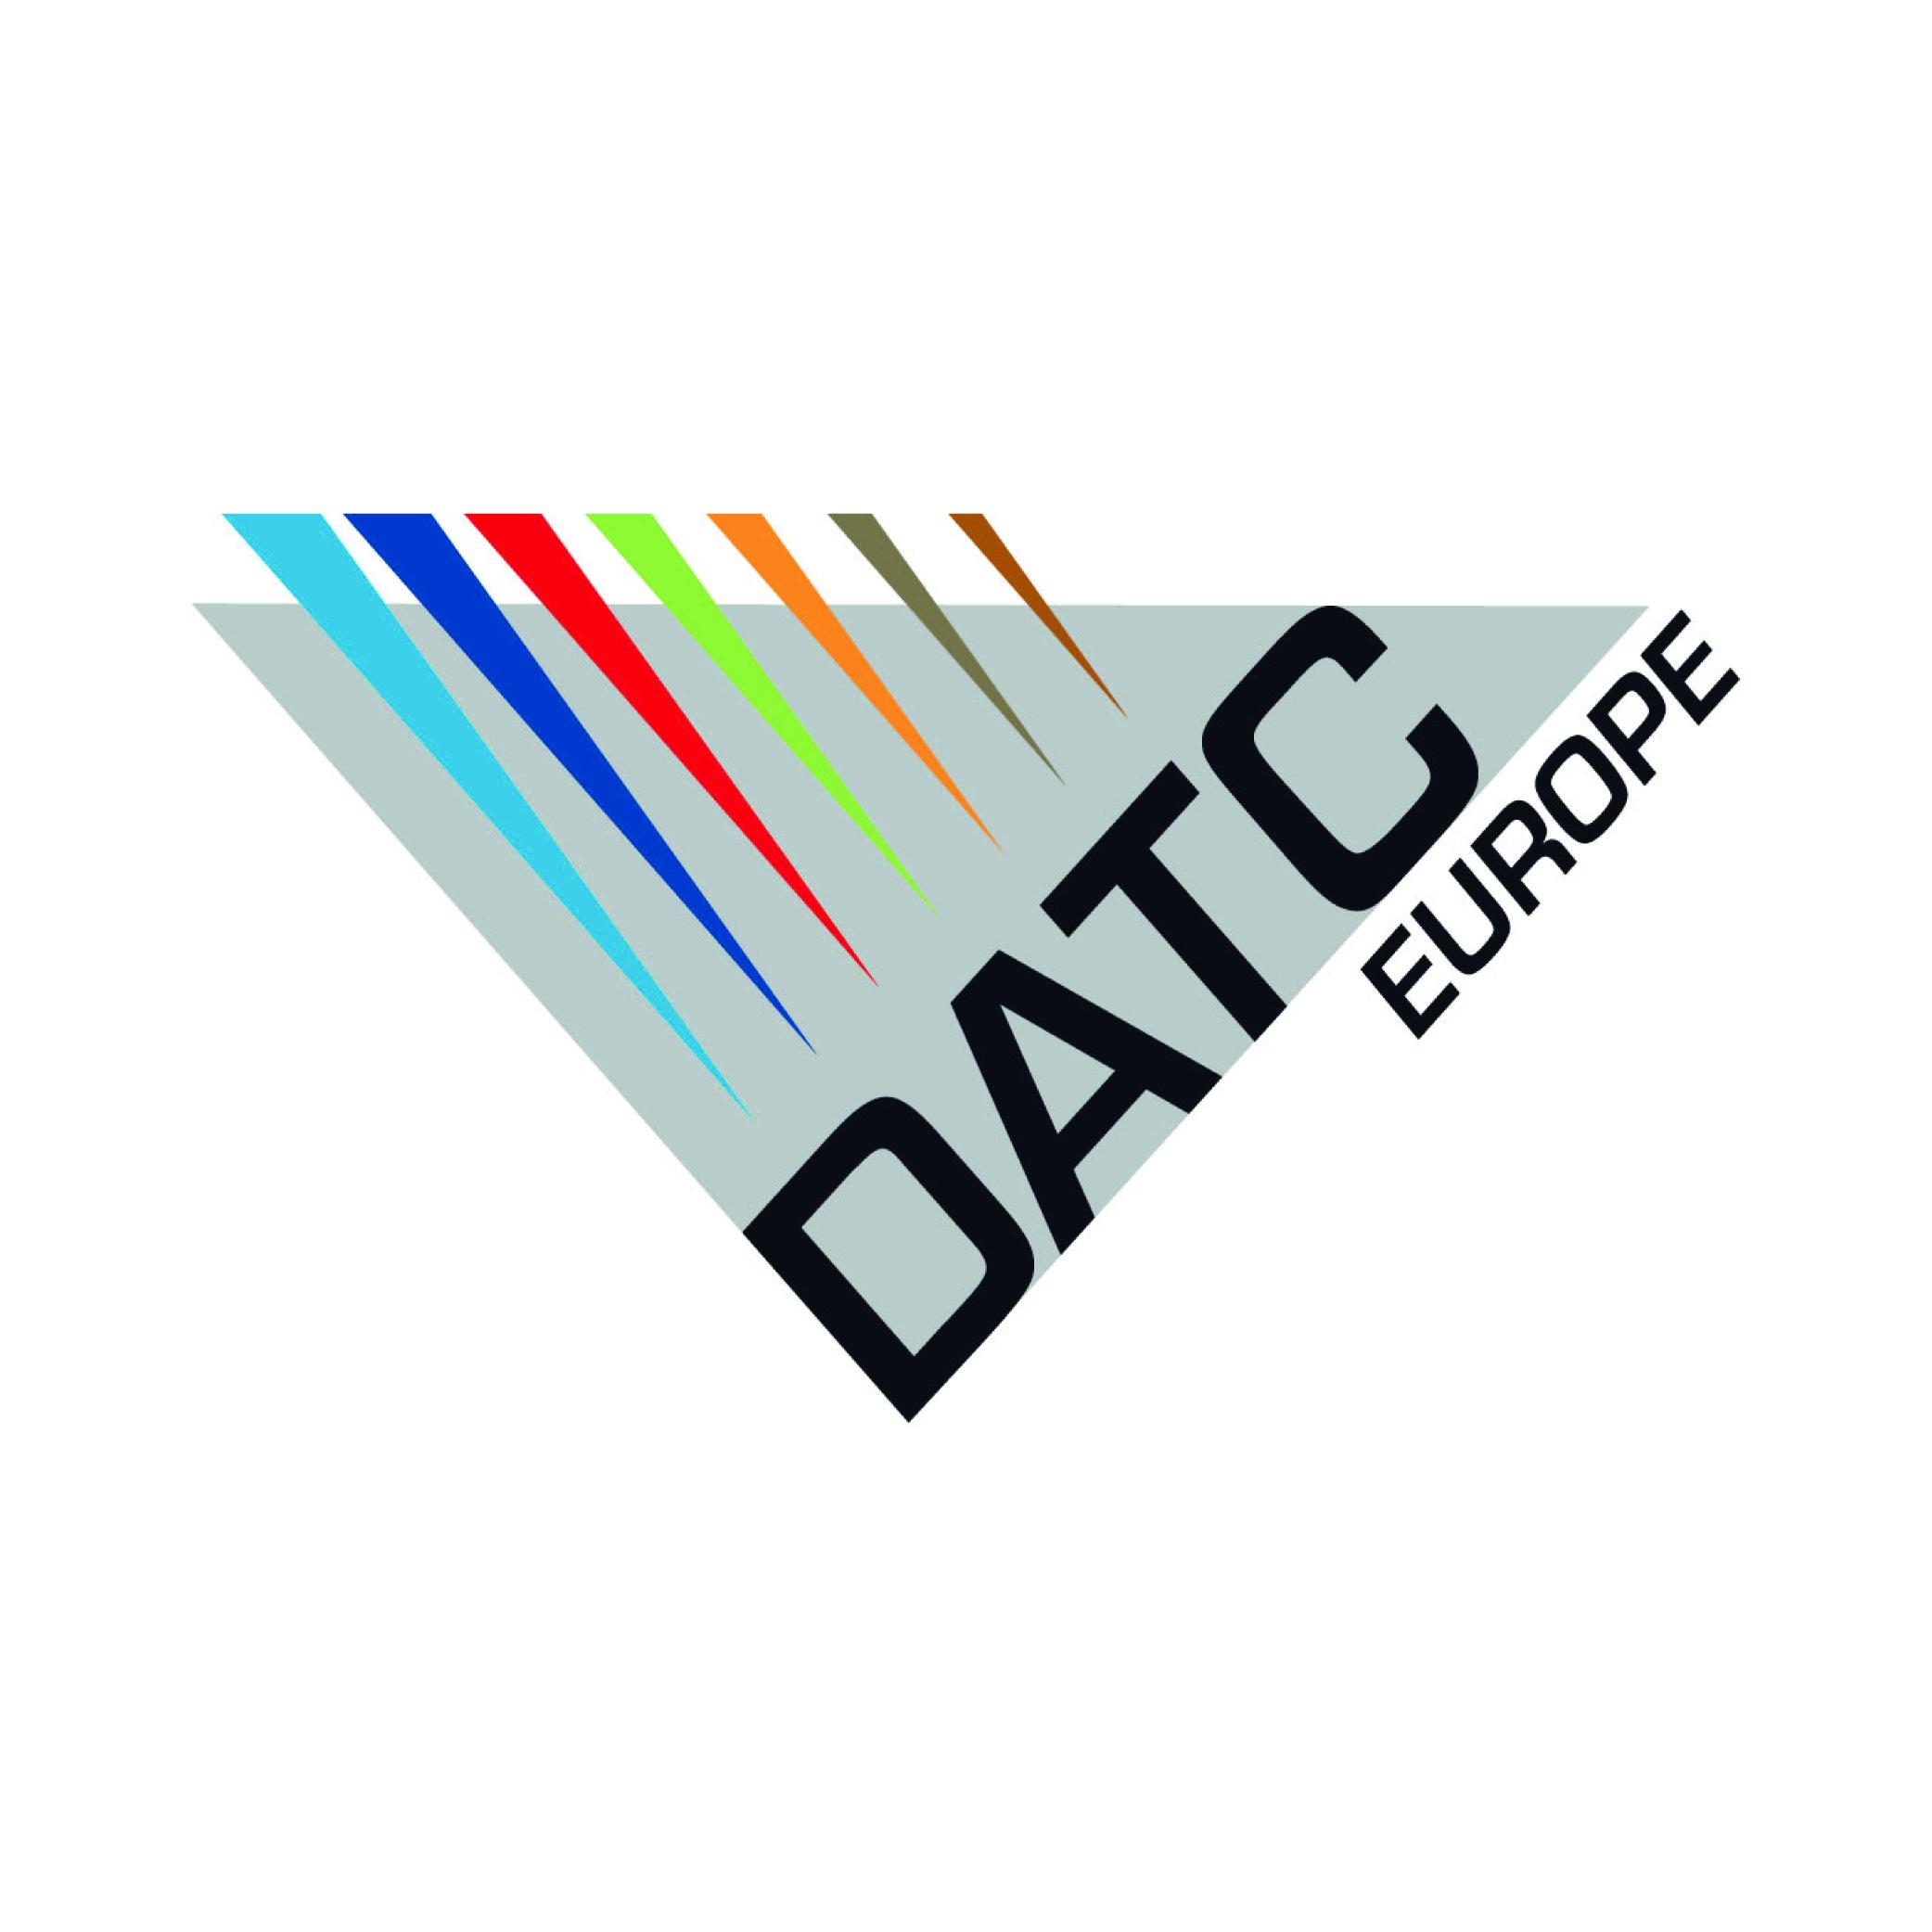 datc_logo.jpg